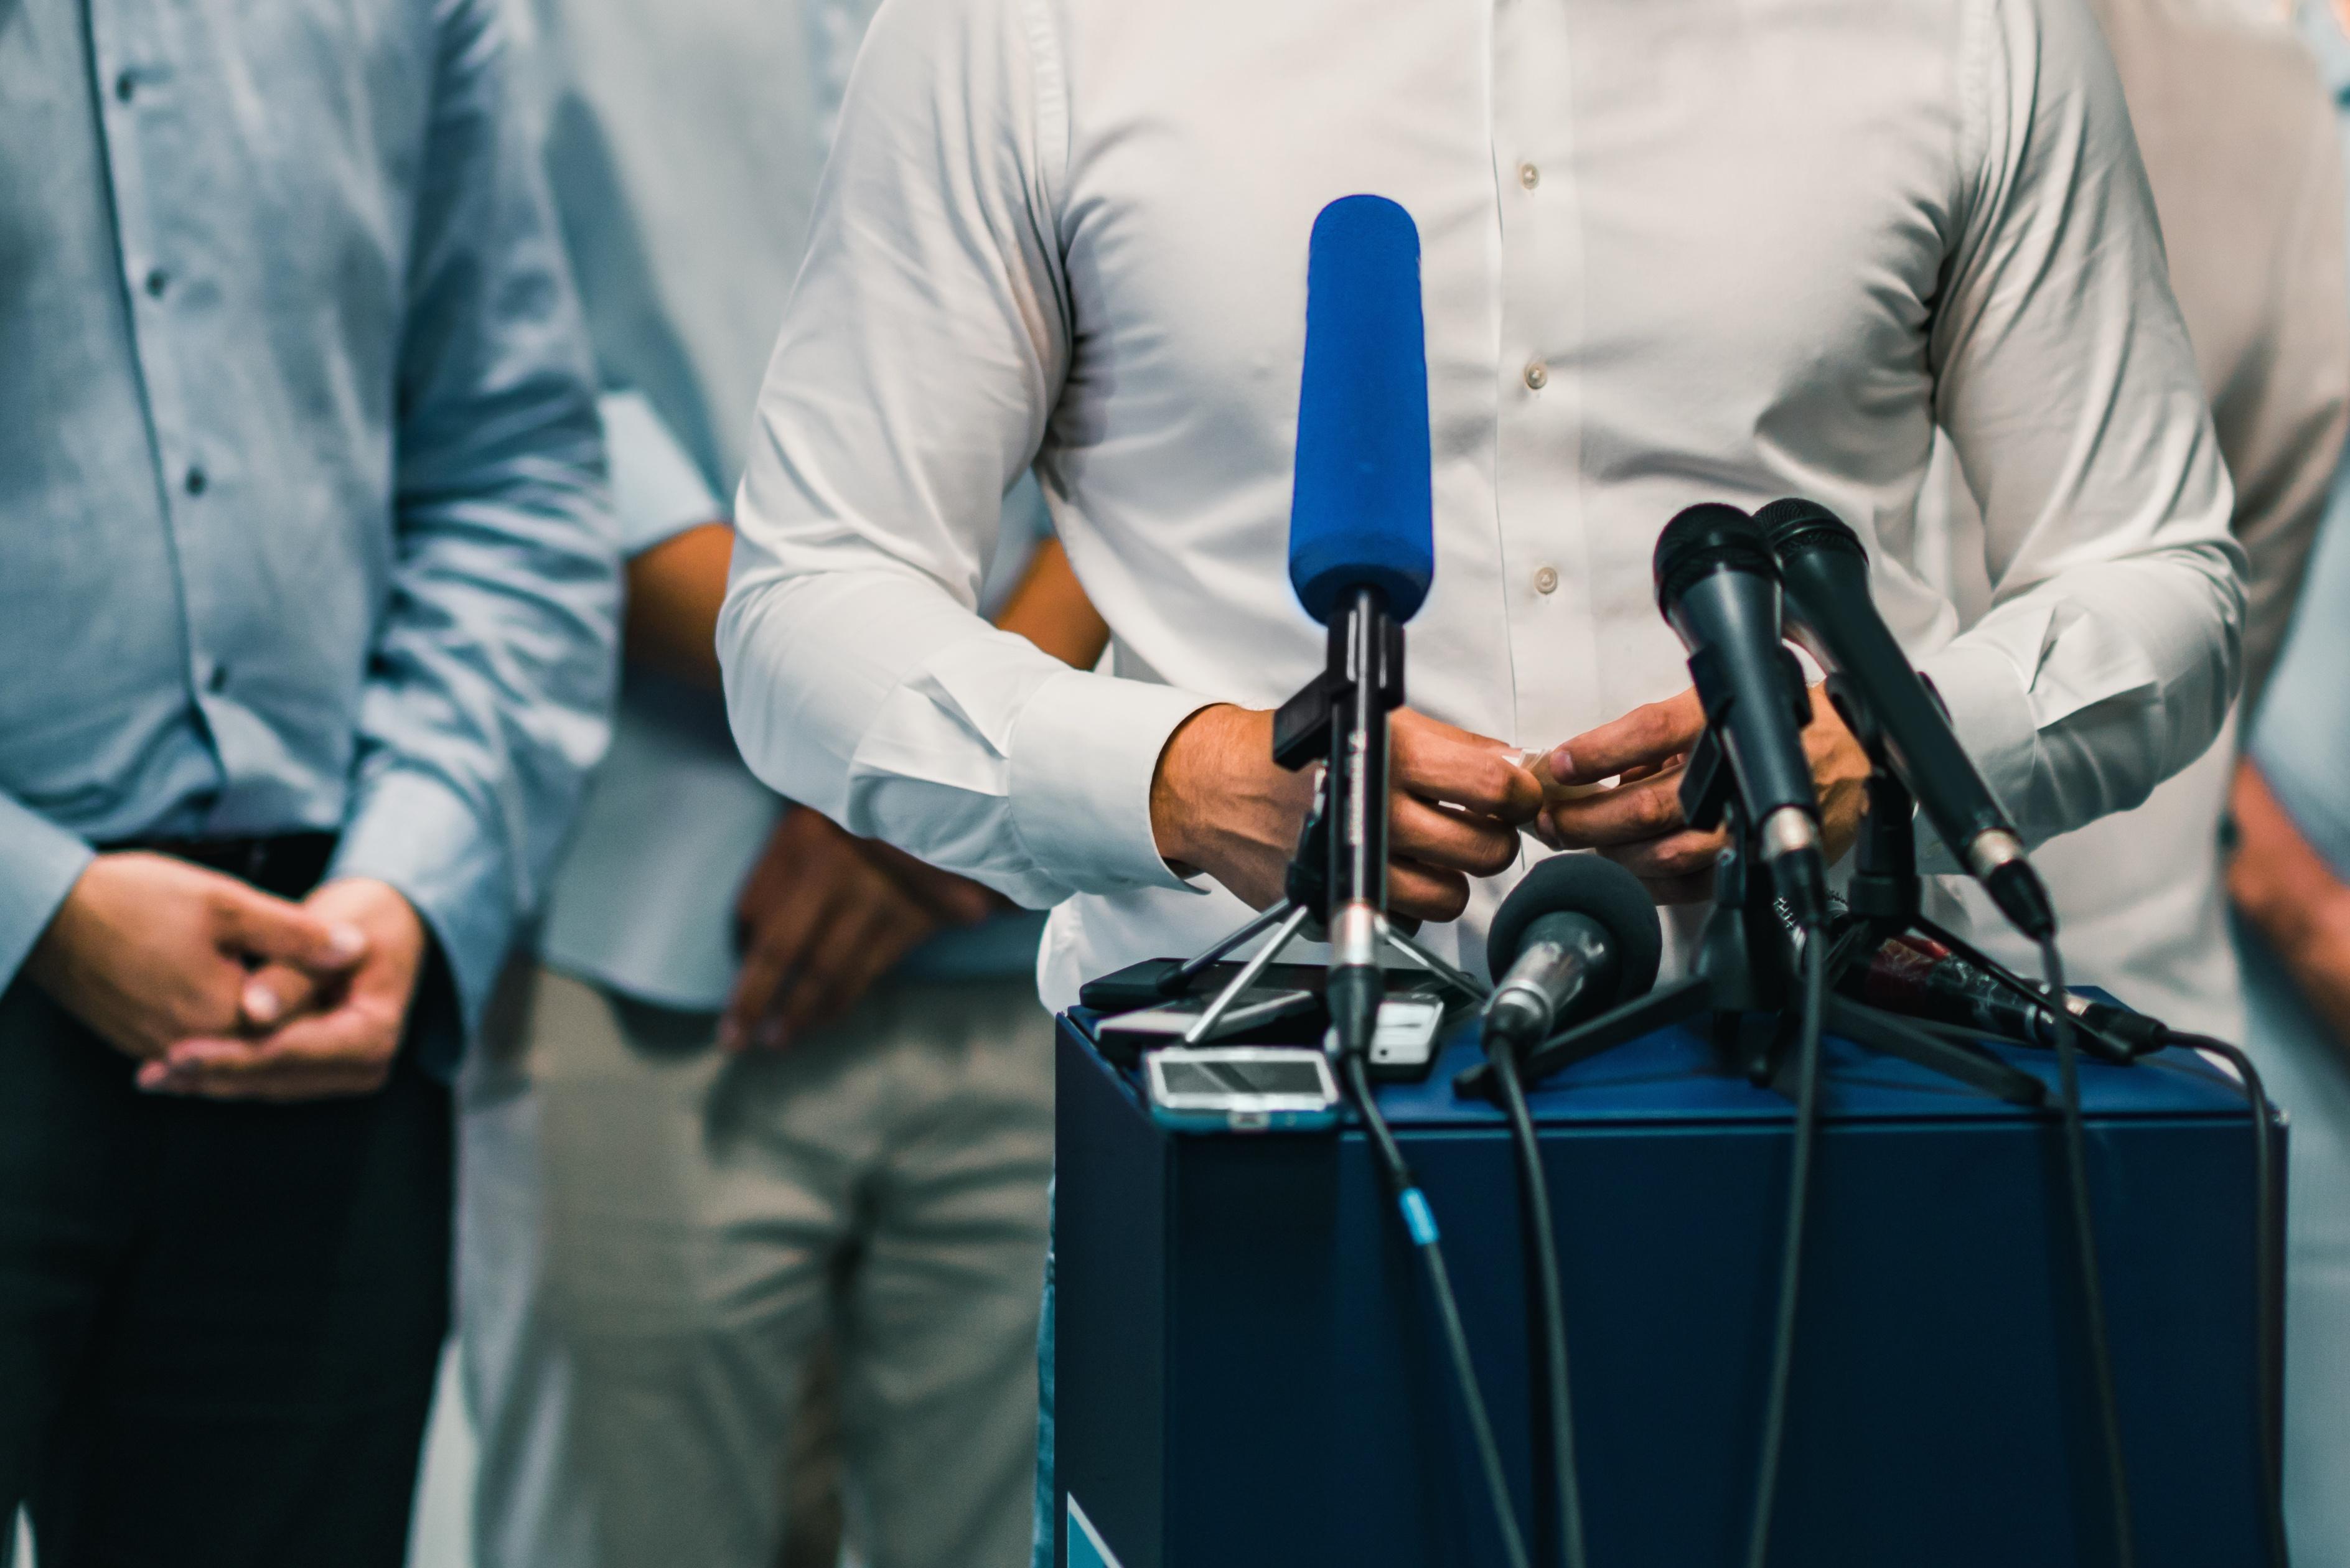 businessman-during-press-conference-PTSUW5K